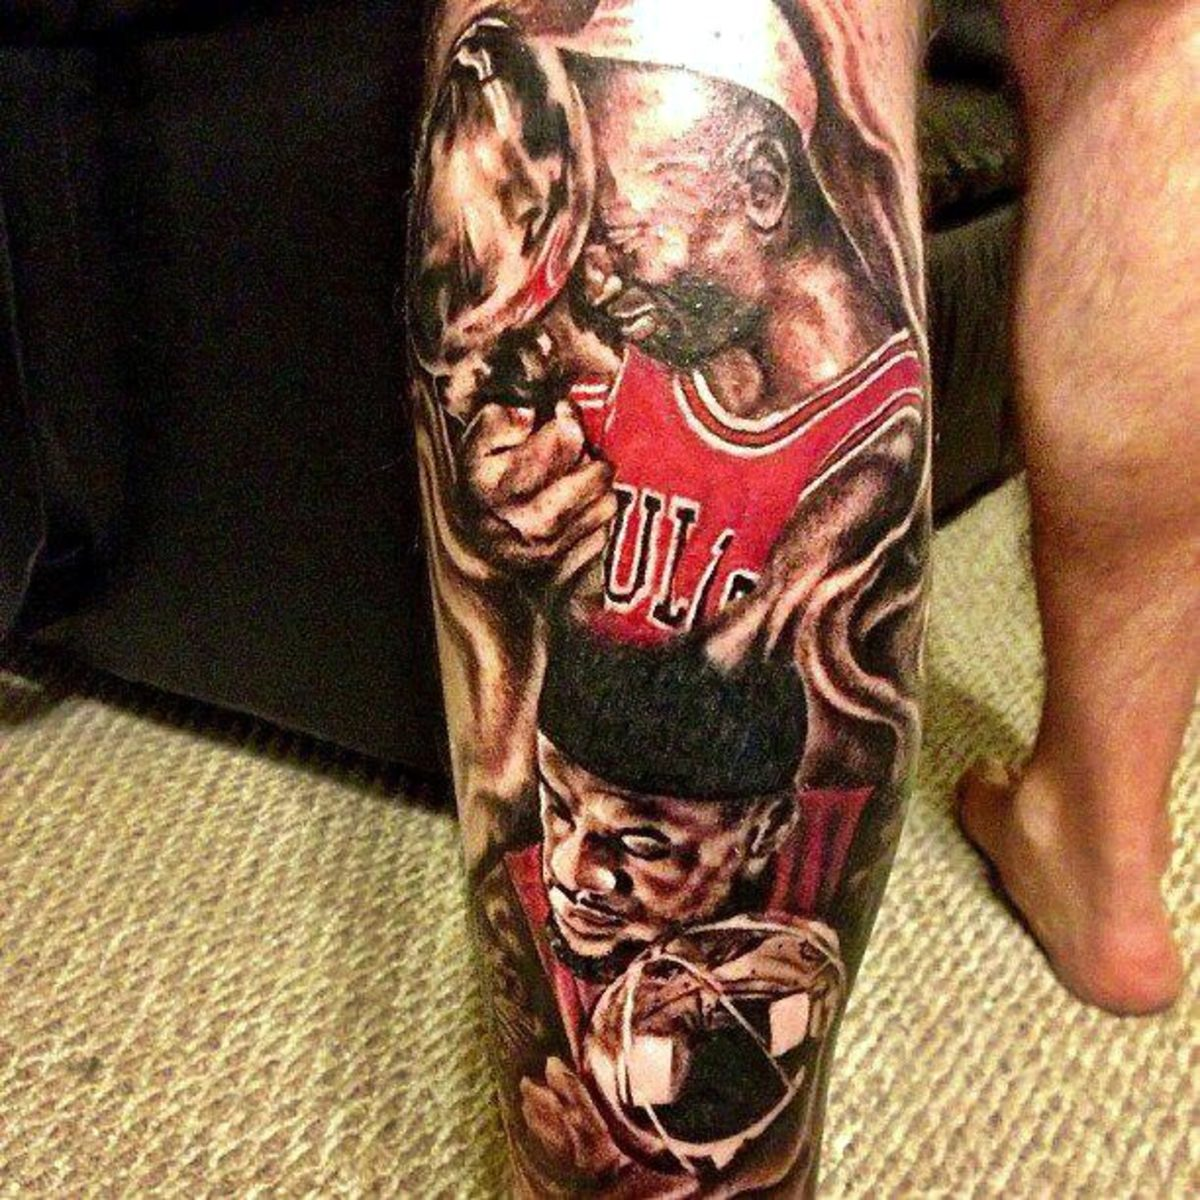 140314113902-michael-jordan-lebron-james-fan-tattoo-single-image-cut.jpg